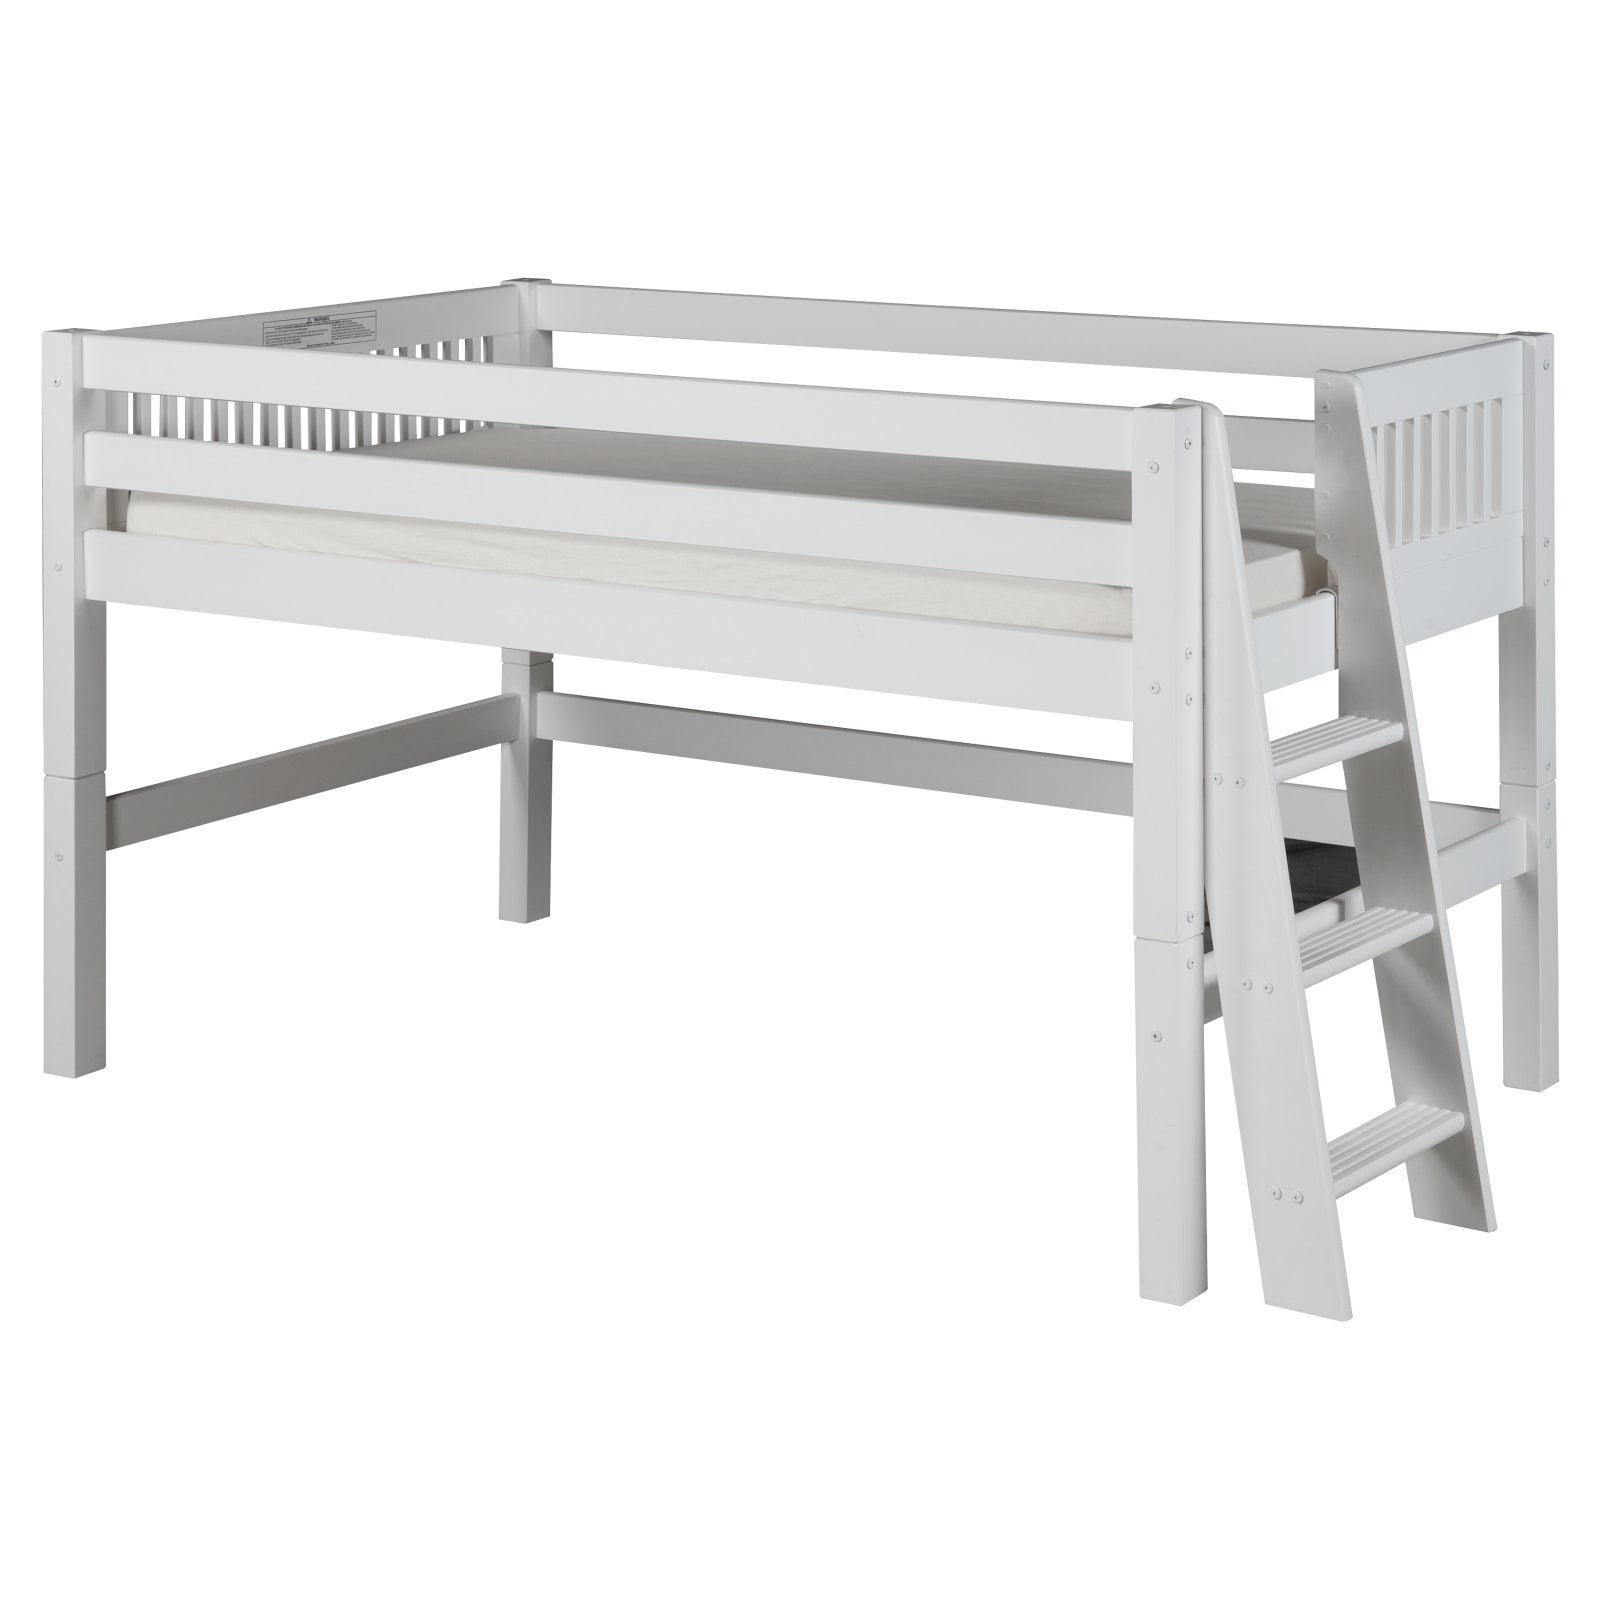 Camaflexi Full Size Low Loft Bed Mission Headboard Lateral Ladder White Finish Walmart Com Walmart Com